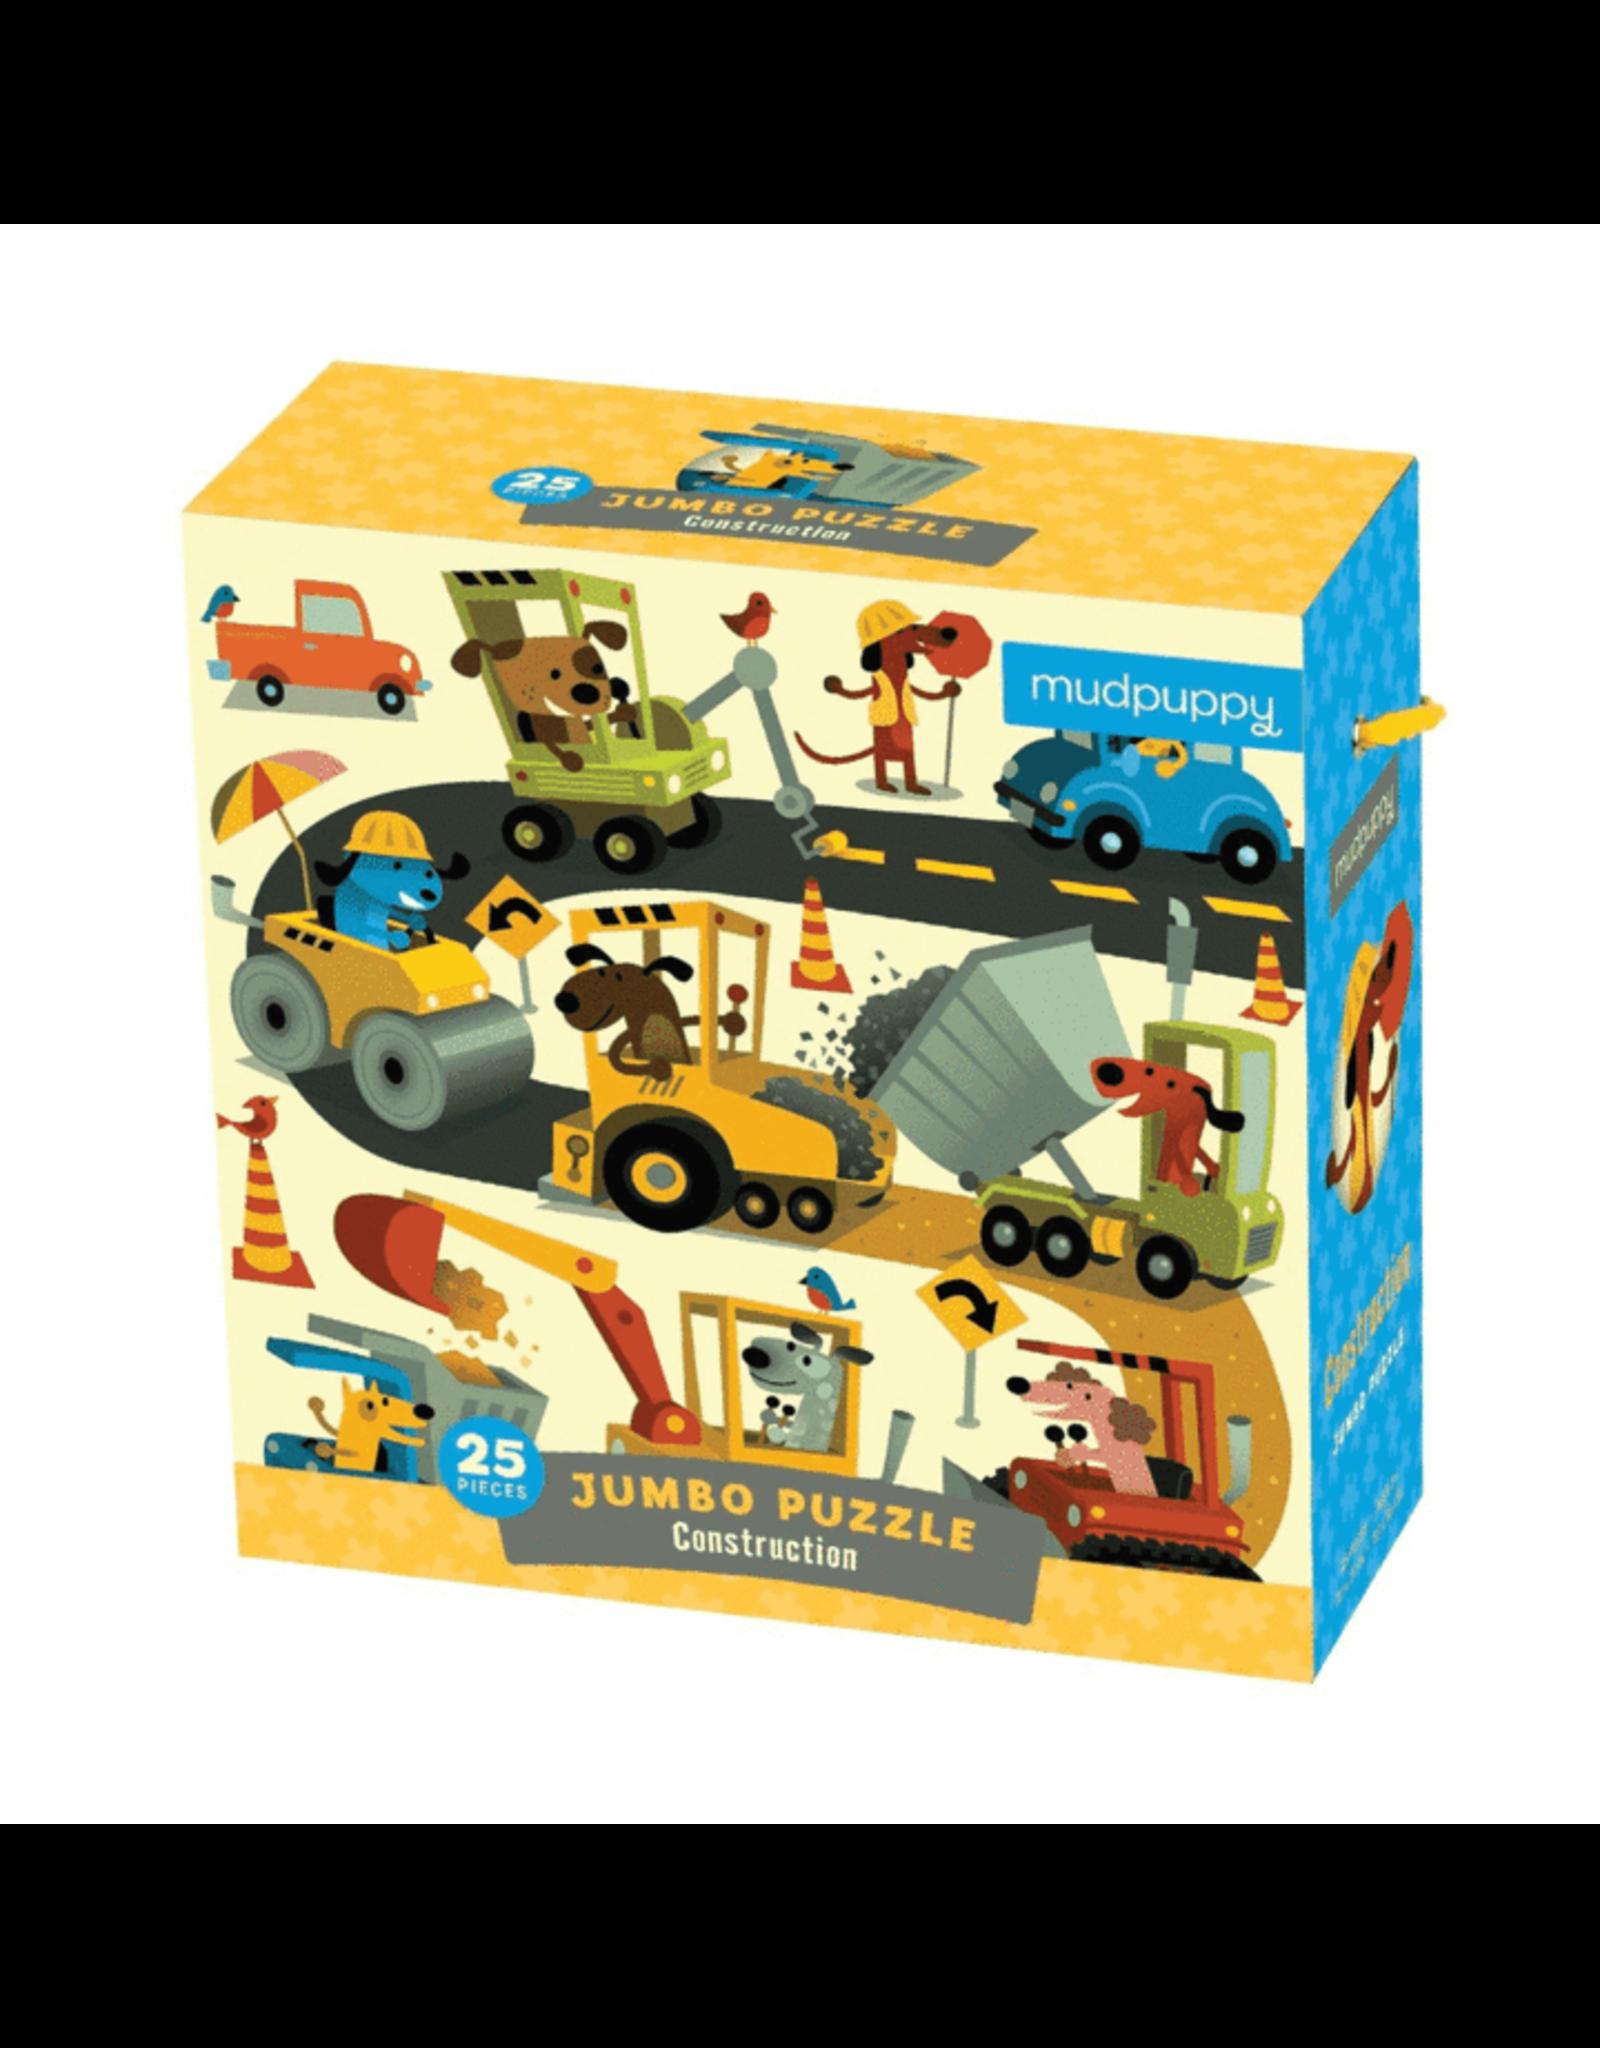 Mudpuppy Construction Jumbo Puzzle (25 pieces)